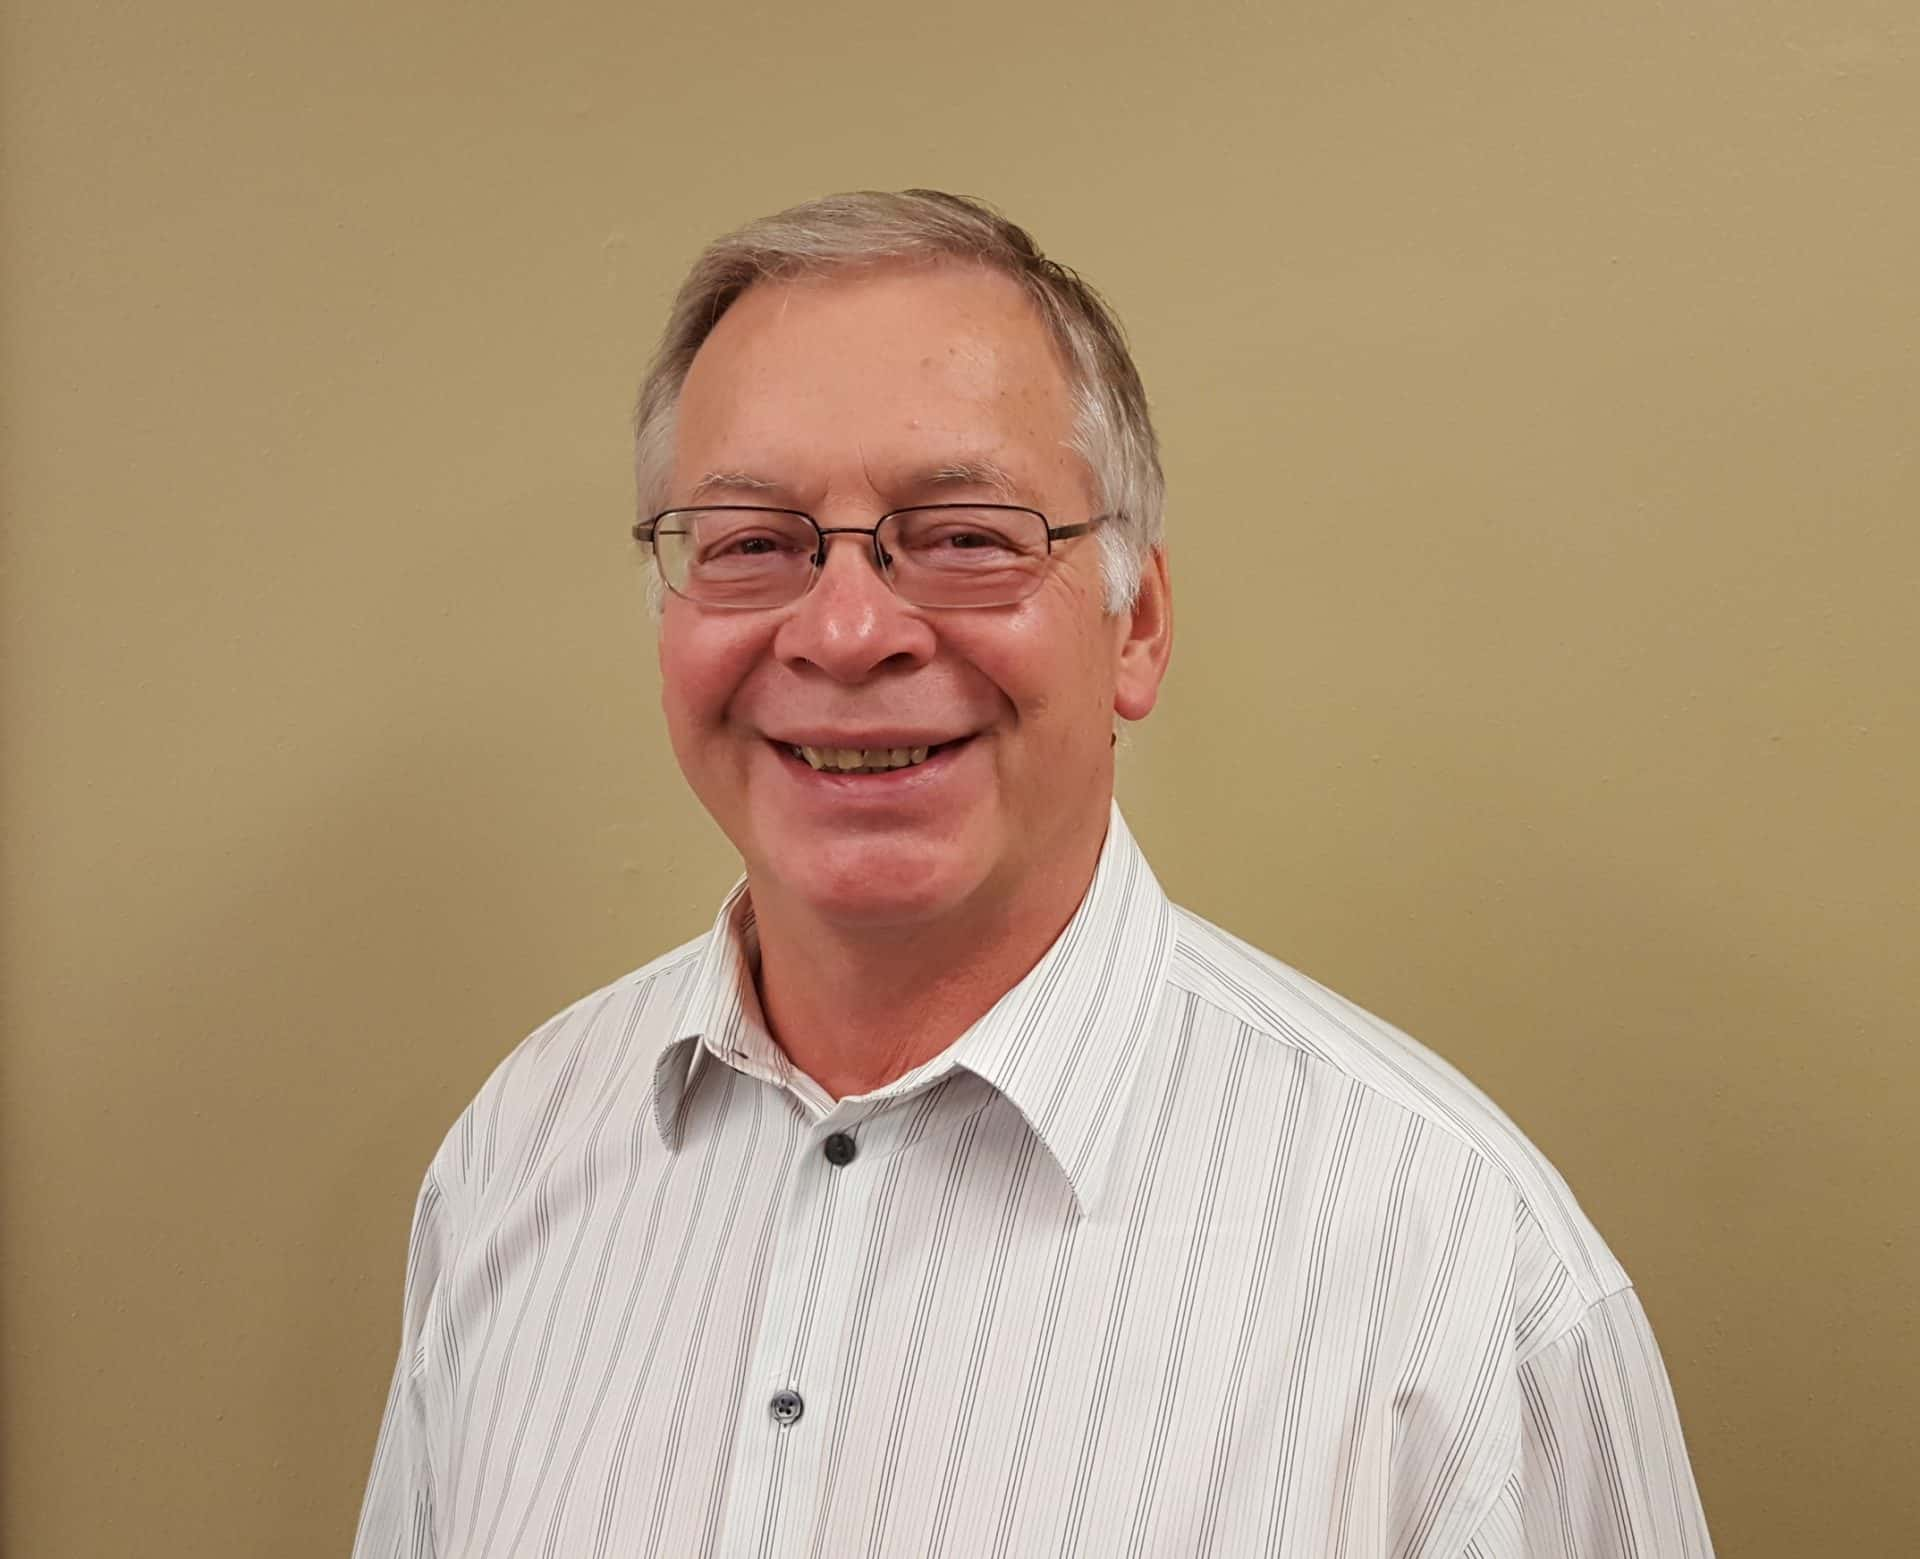 Community Ed instructor John Oestreicher